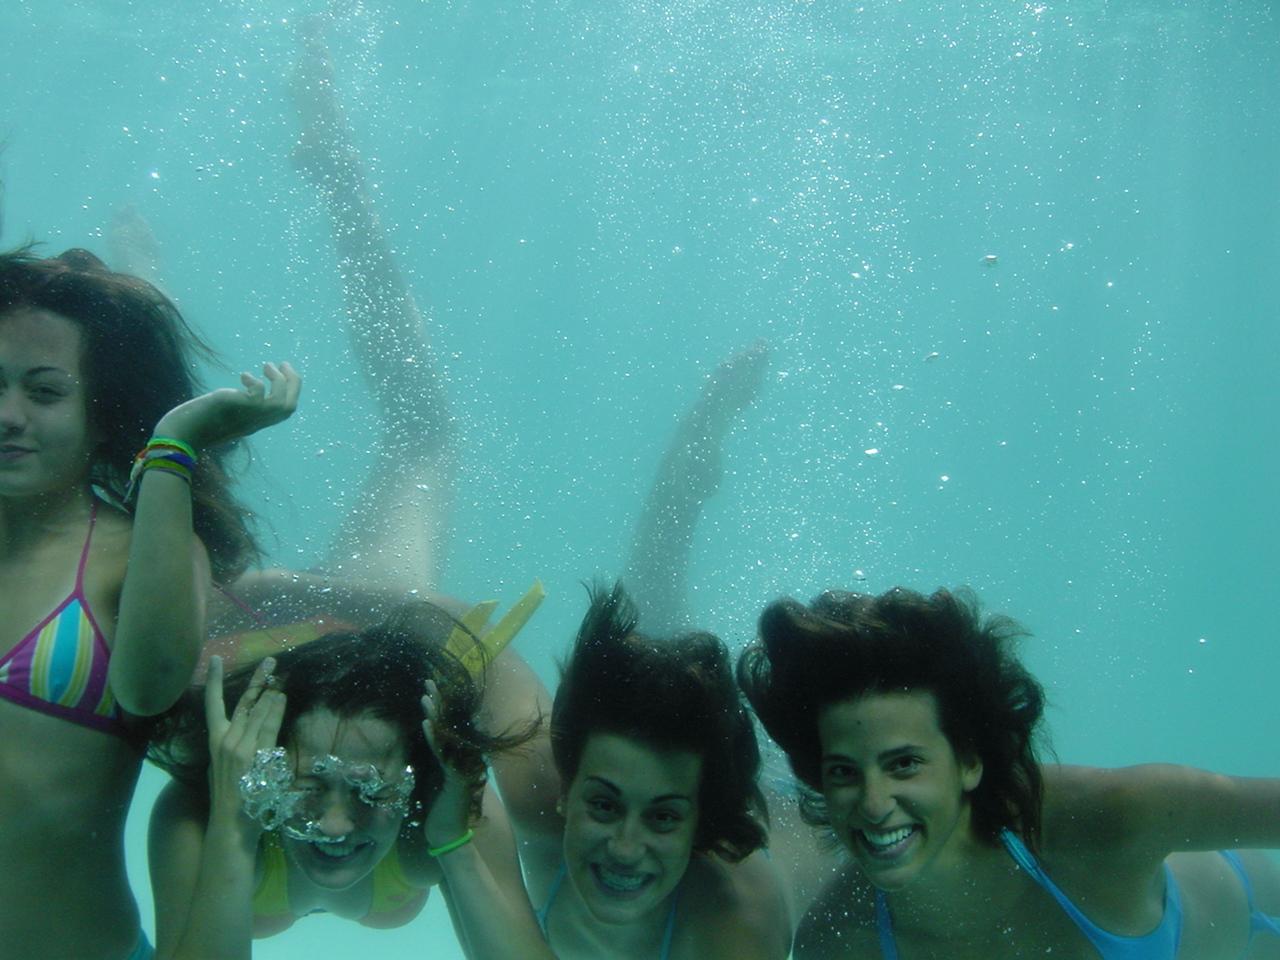 ...I was part of a swimming team - Évora (Portugal), 1991-2003